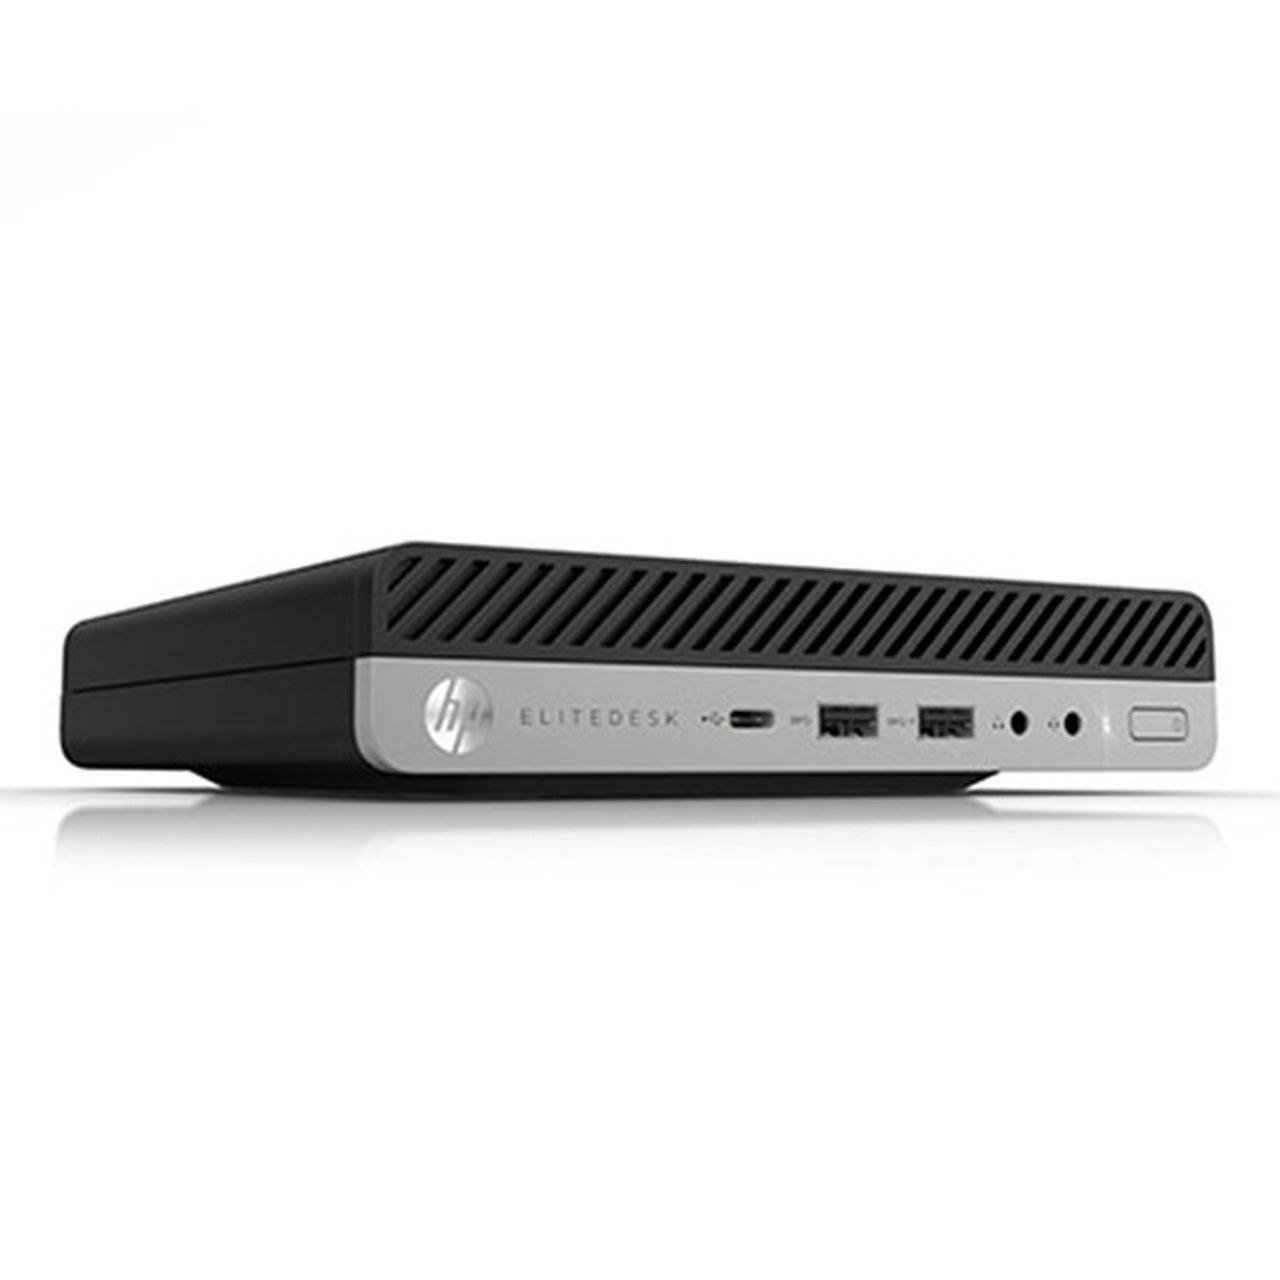 HP EliteDesk 800 G3 Micro Intel i5 6500t 2.50Ghz 8Gb Ram 256Gb SSD Wifi Win 10